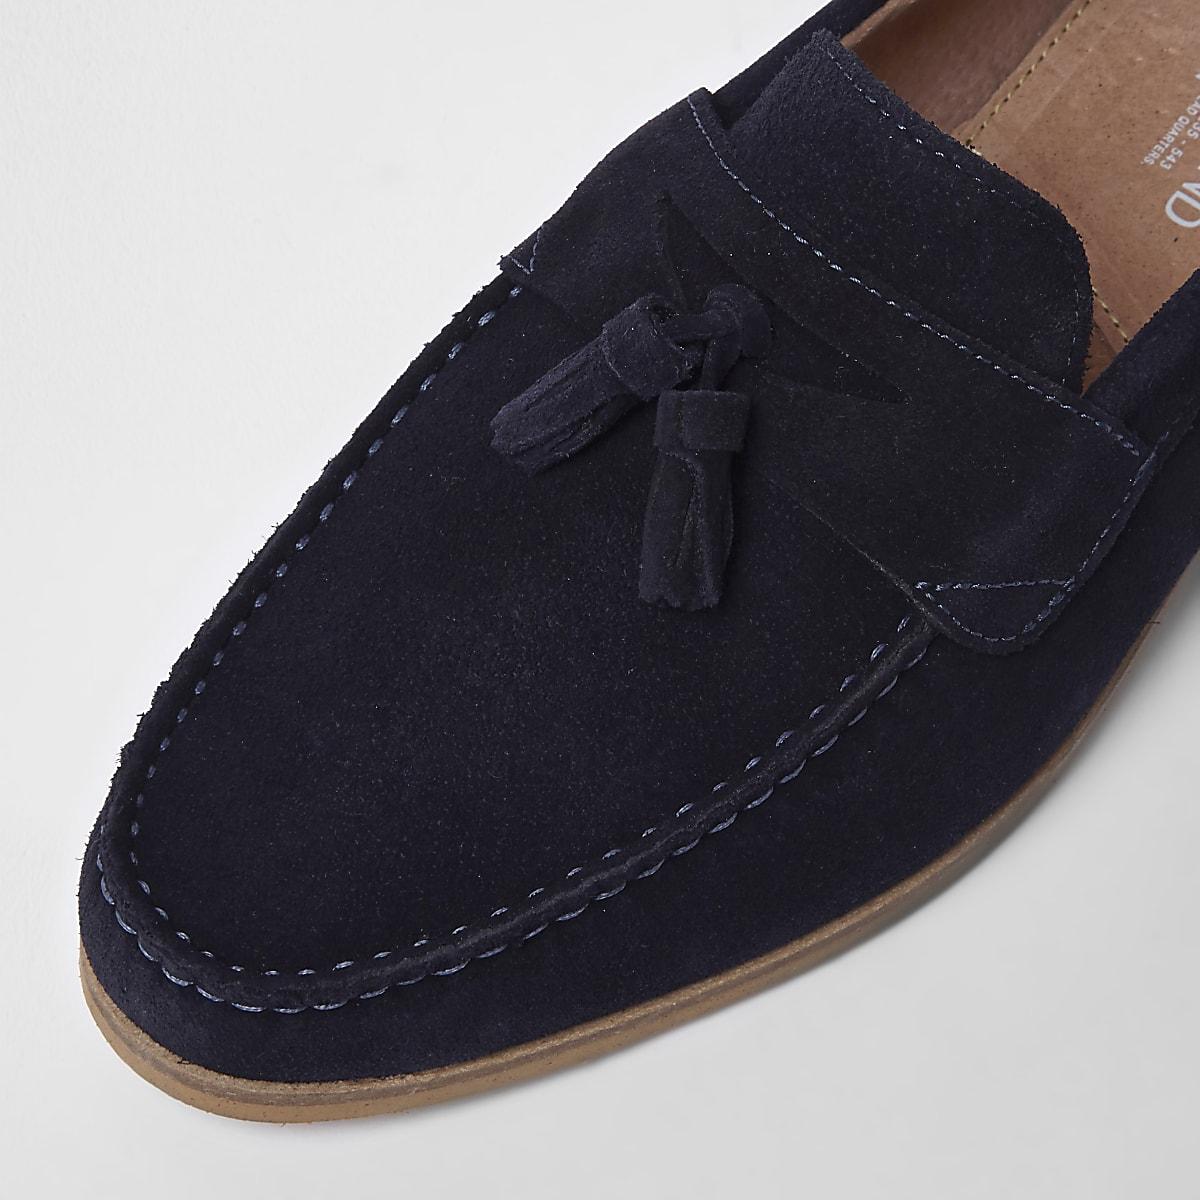 088953c7dc29 Mocassins en daim bleu marine à pampilles - Chaussures - Chaussures ...